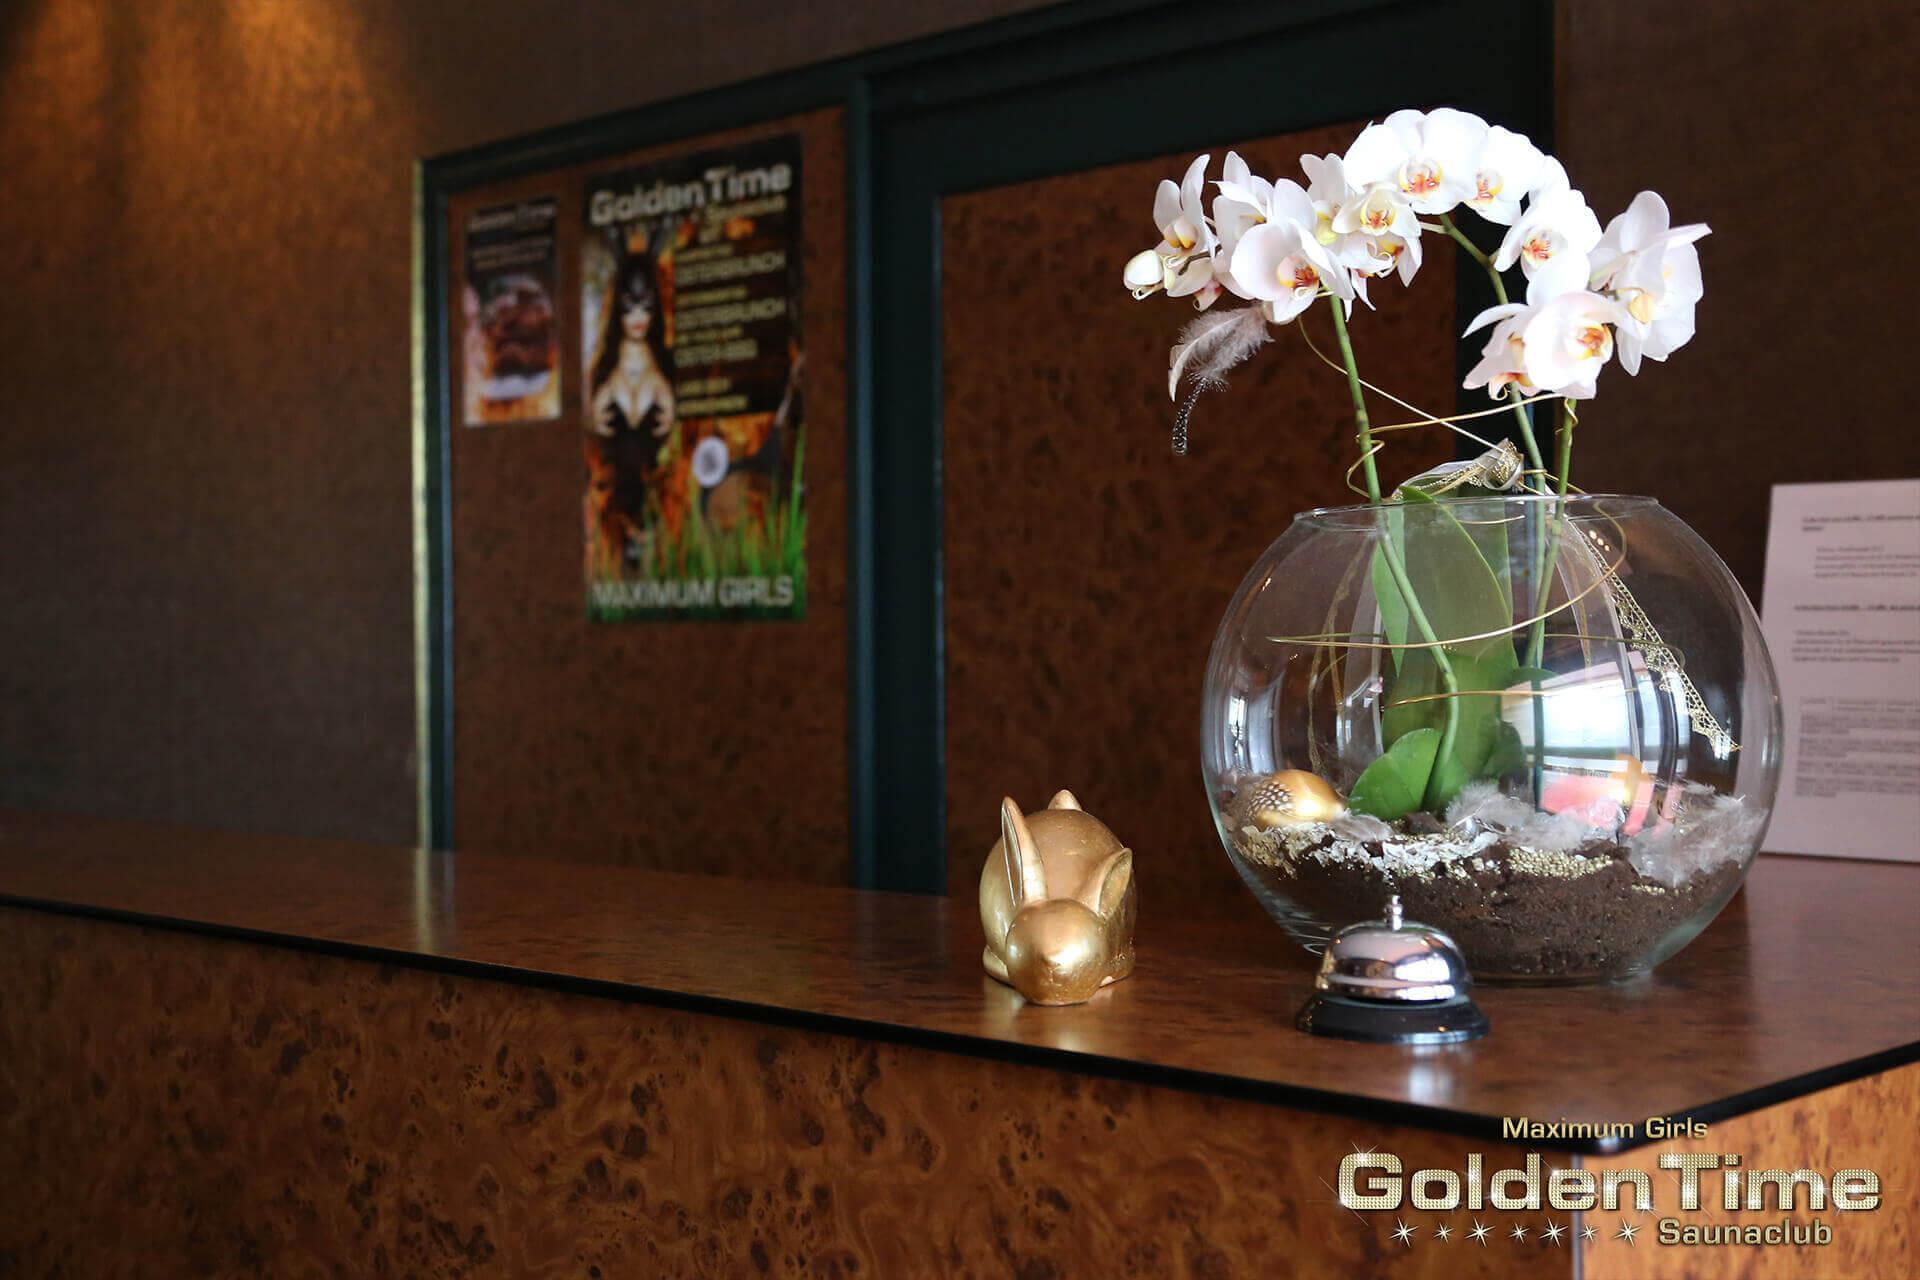 02-ostern-2016-pic-12-goldentime-saunaclub.jpg